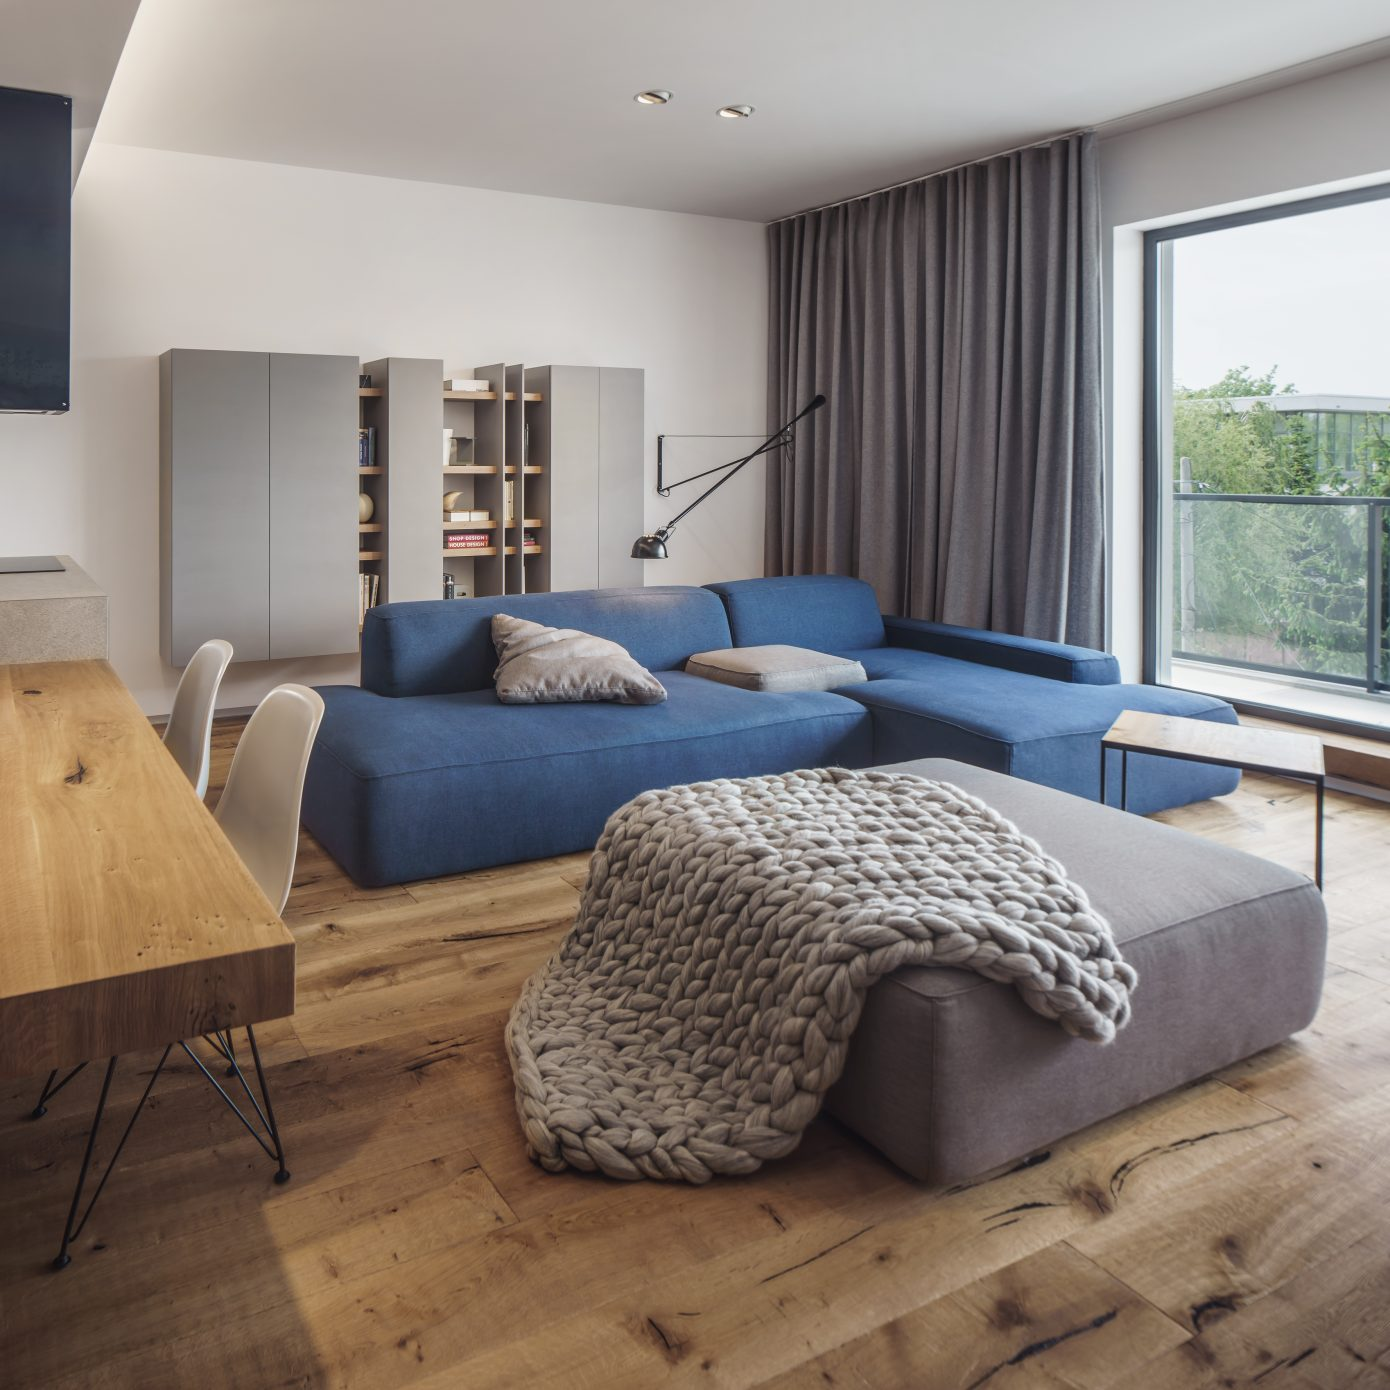 Local Studio Apartments: RS Apartment By STUDIO 1408